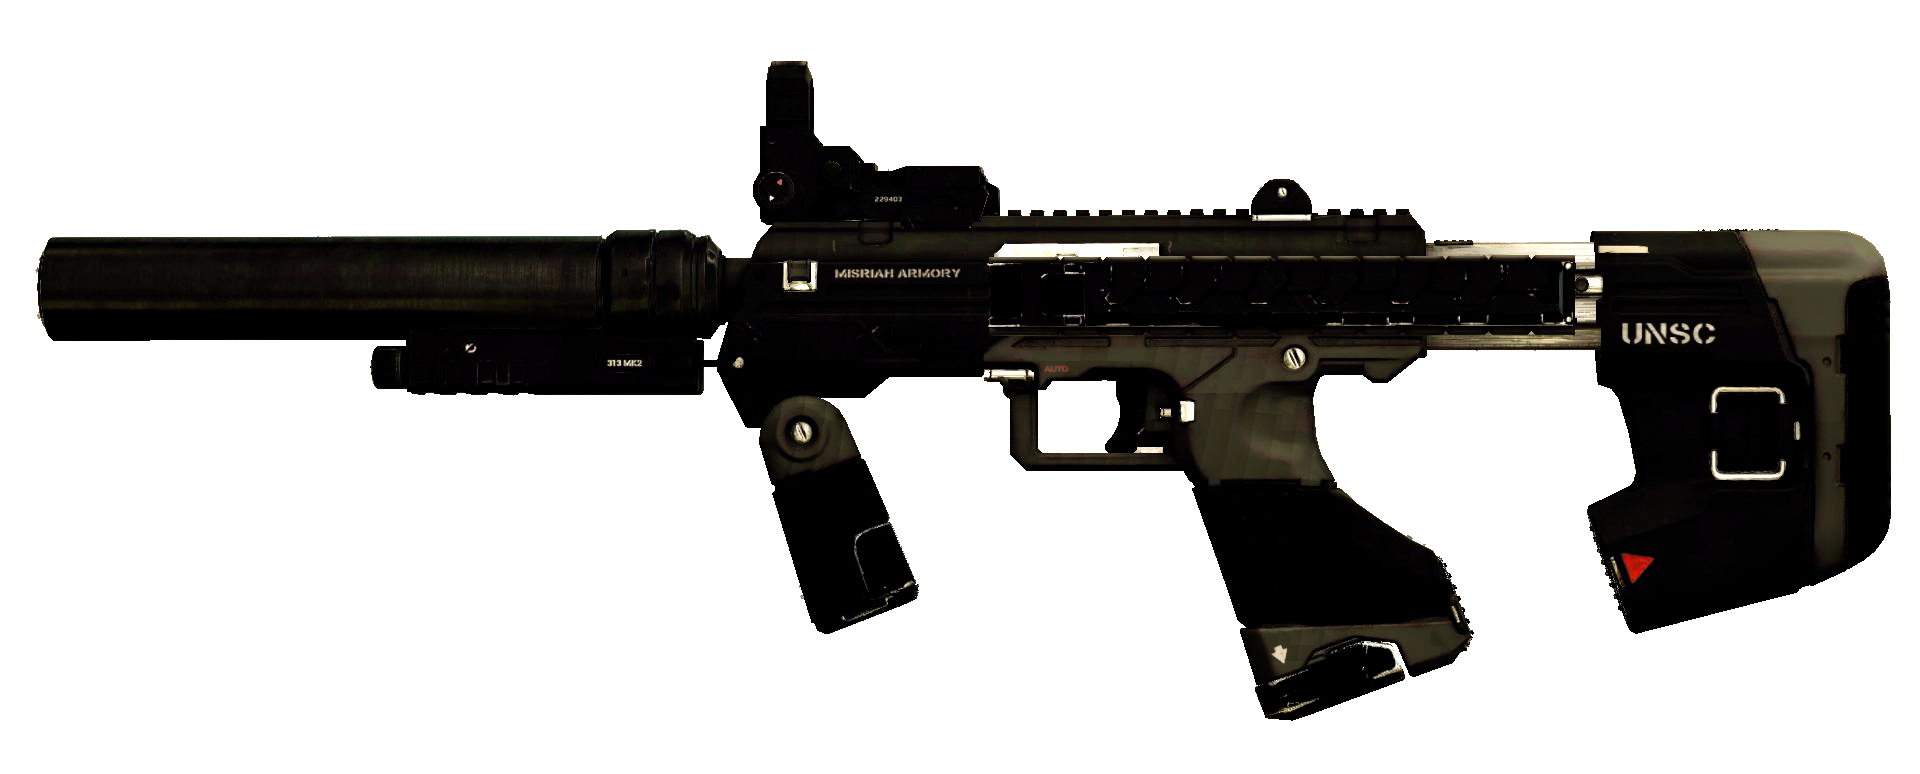 M7S Caseless Submachine Gun